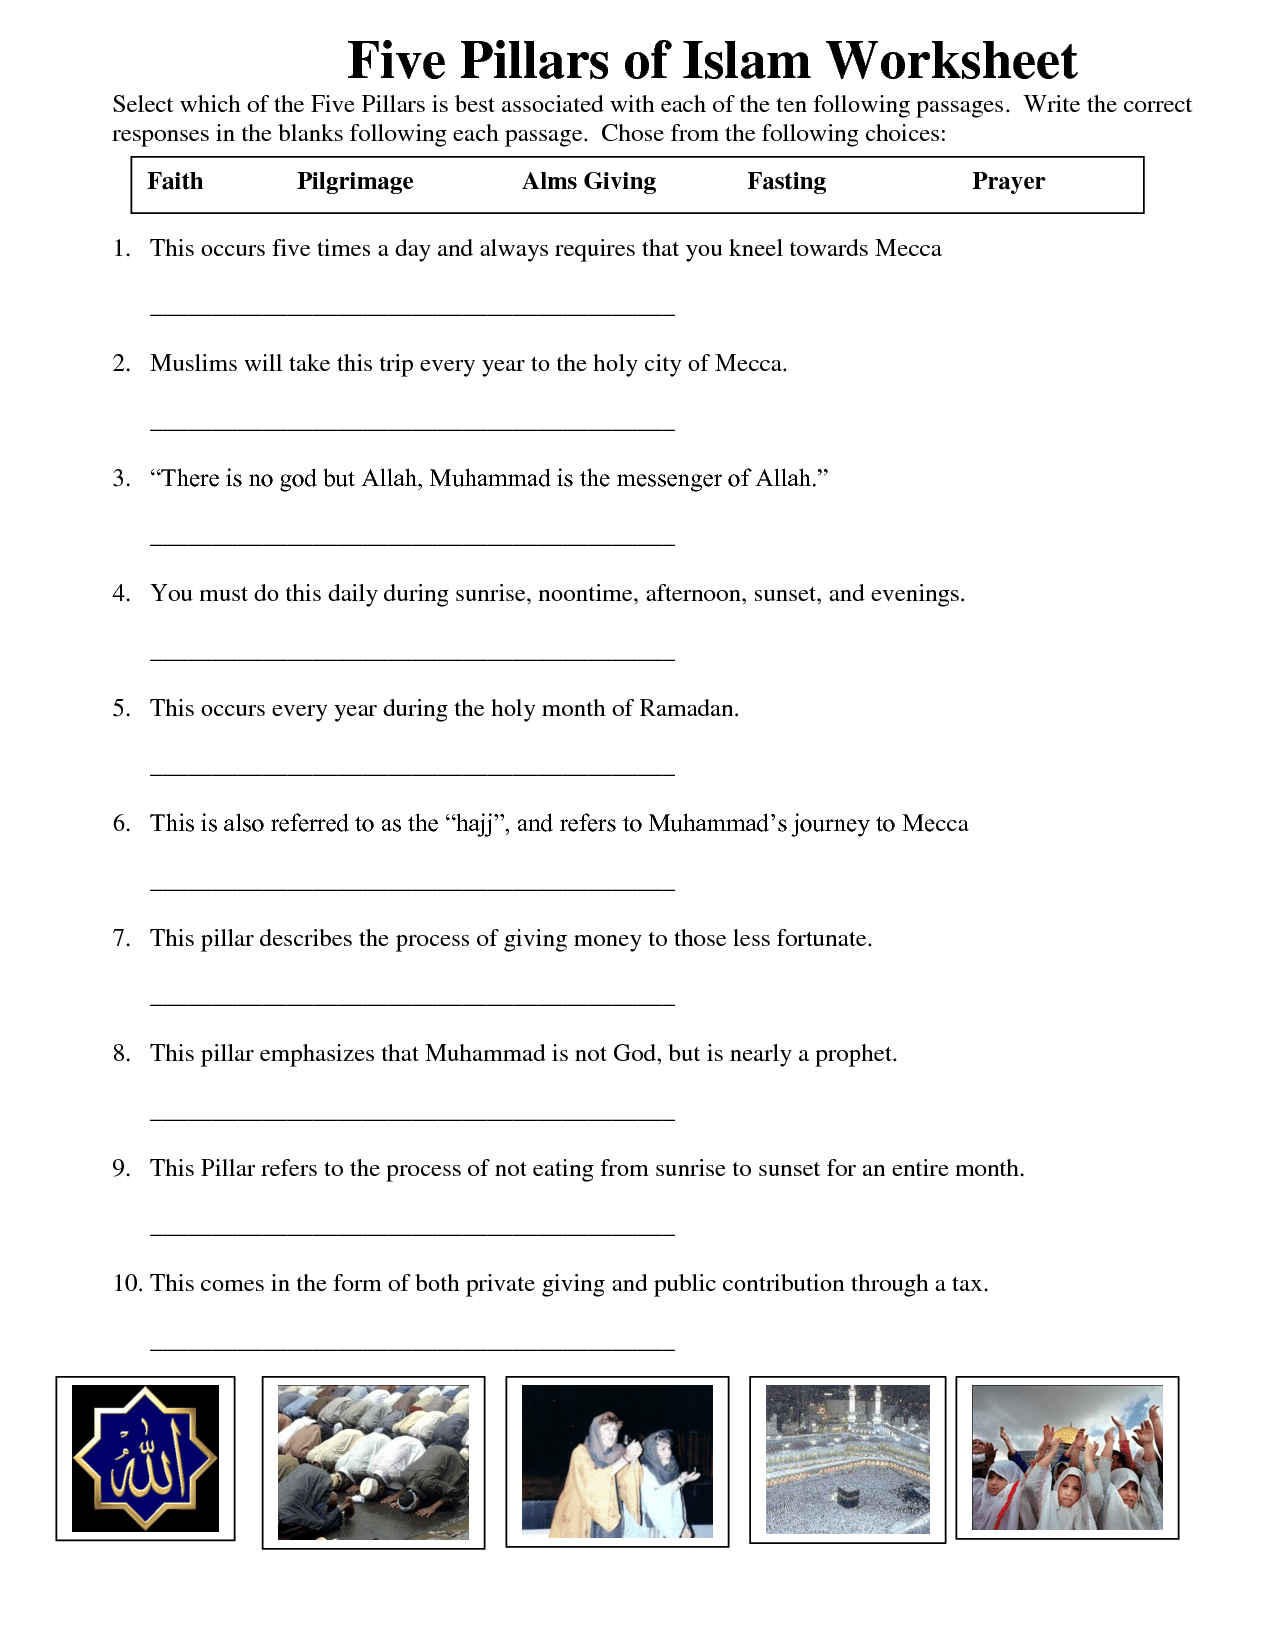 Five Pillars Of Islam W S